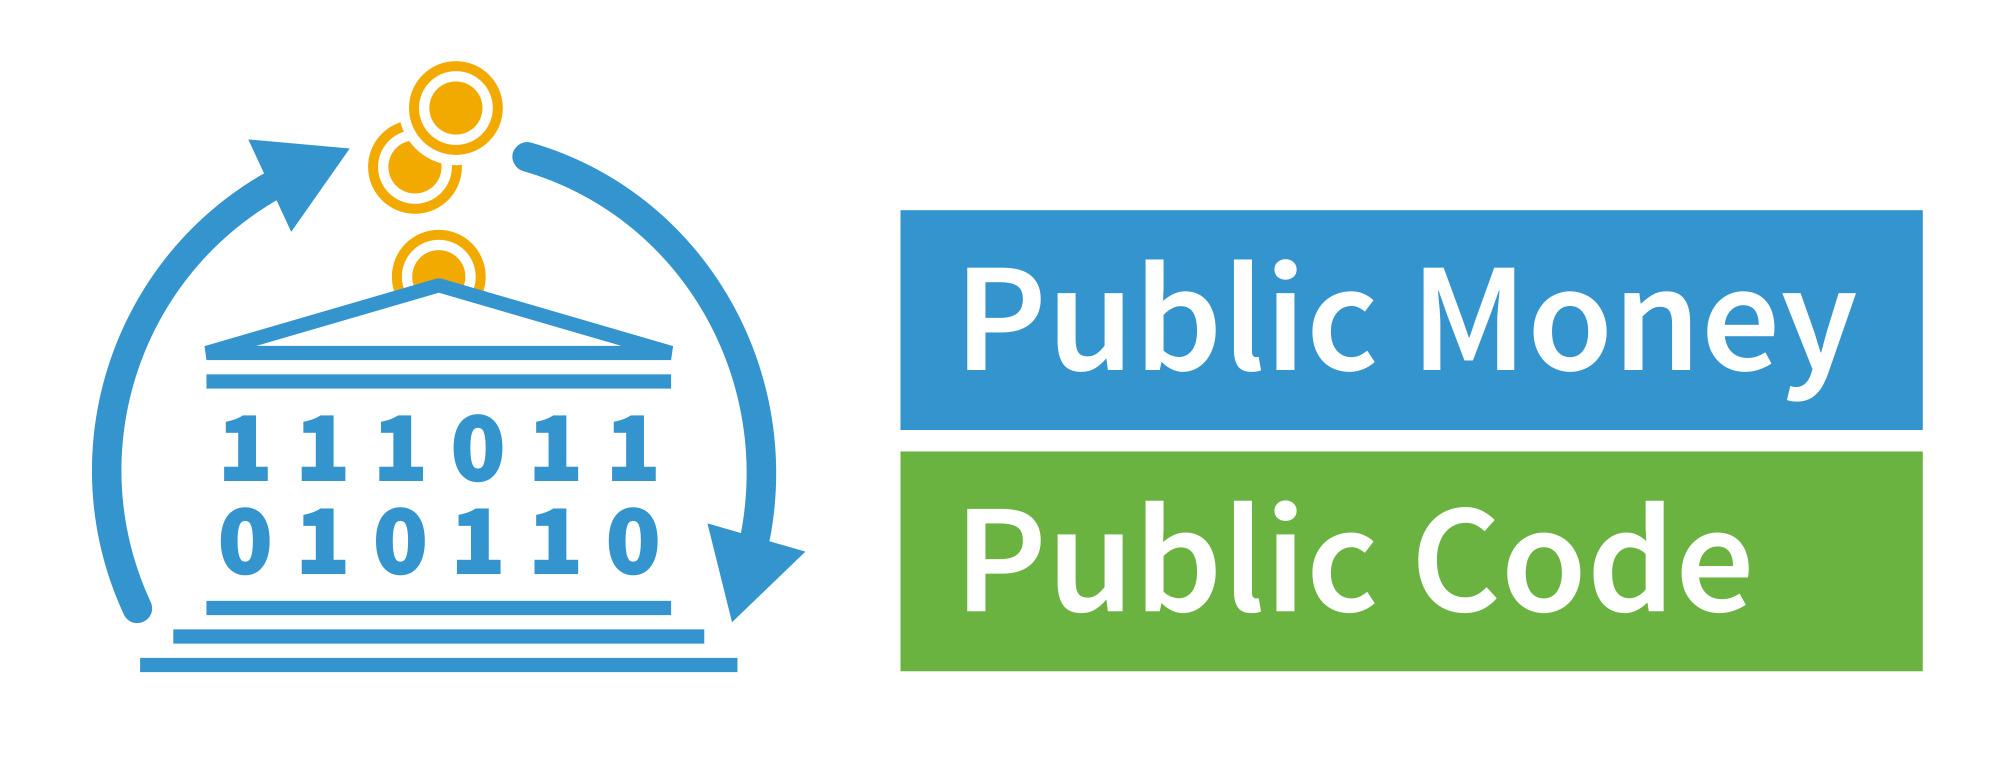 Pmpc logo horizontal